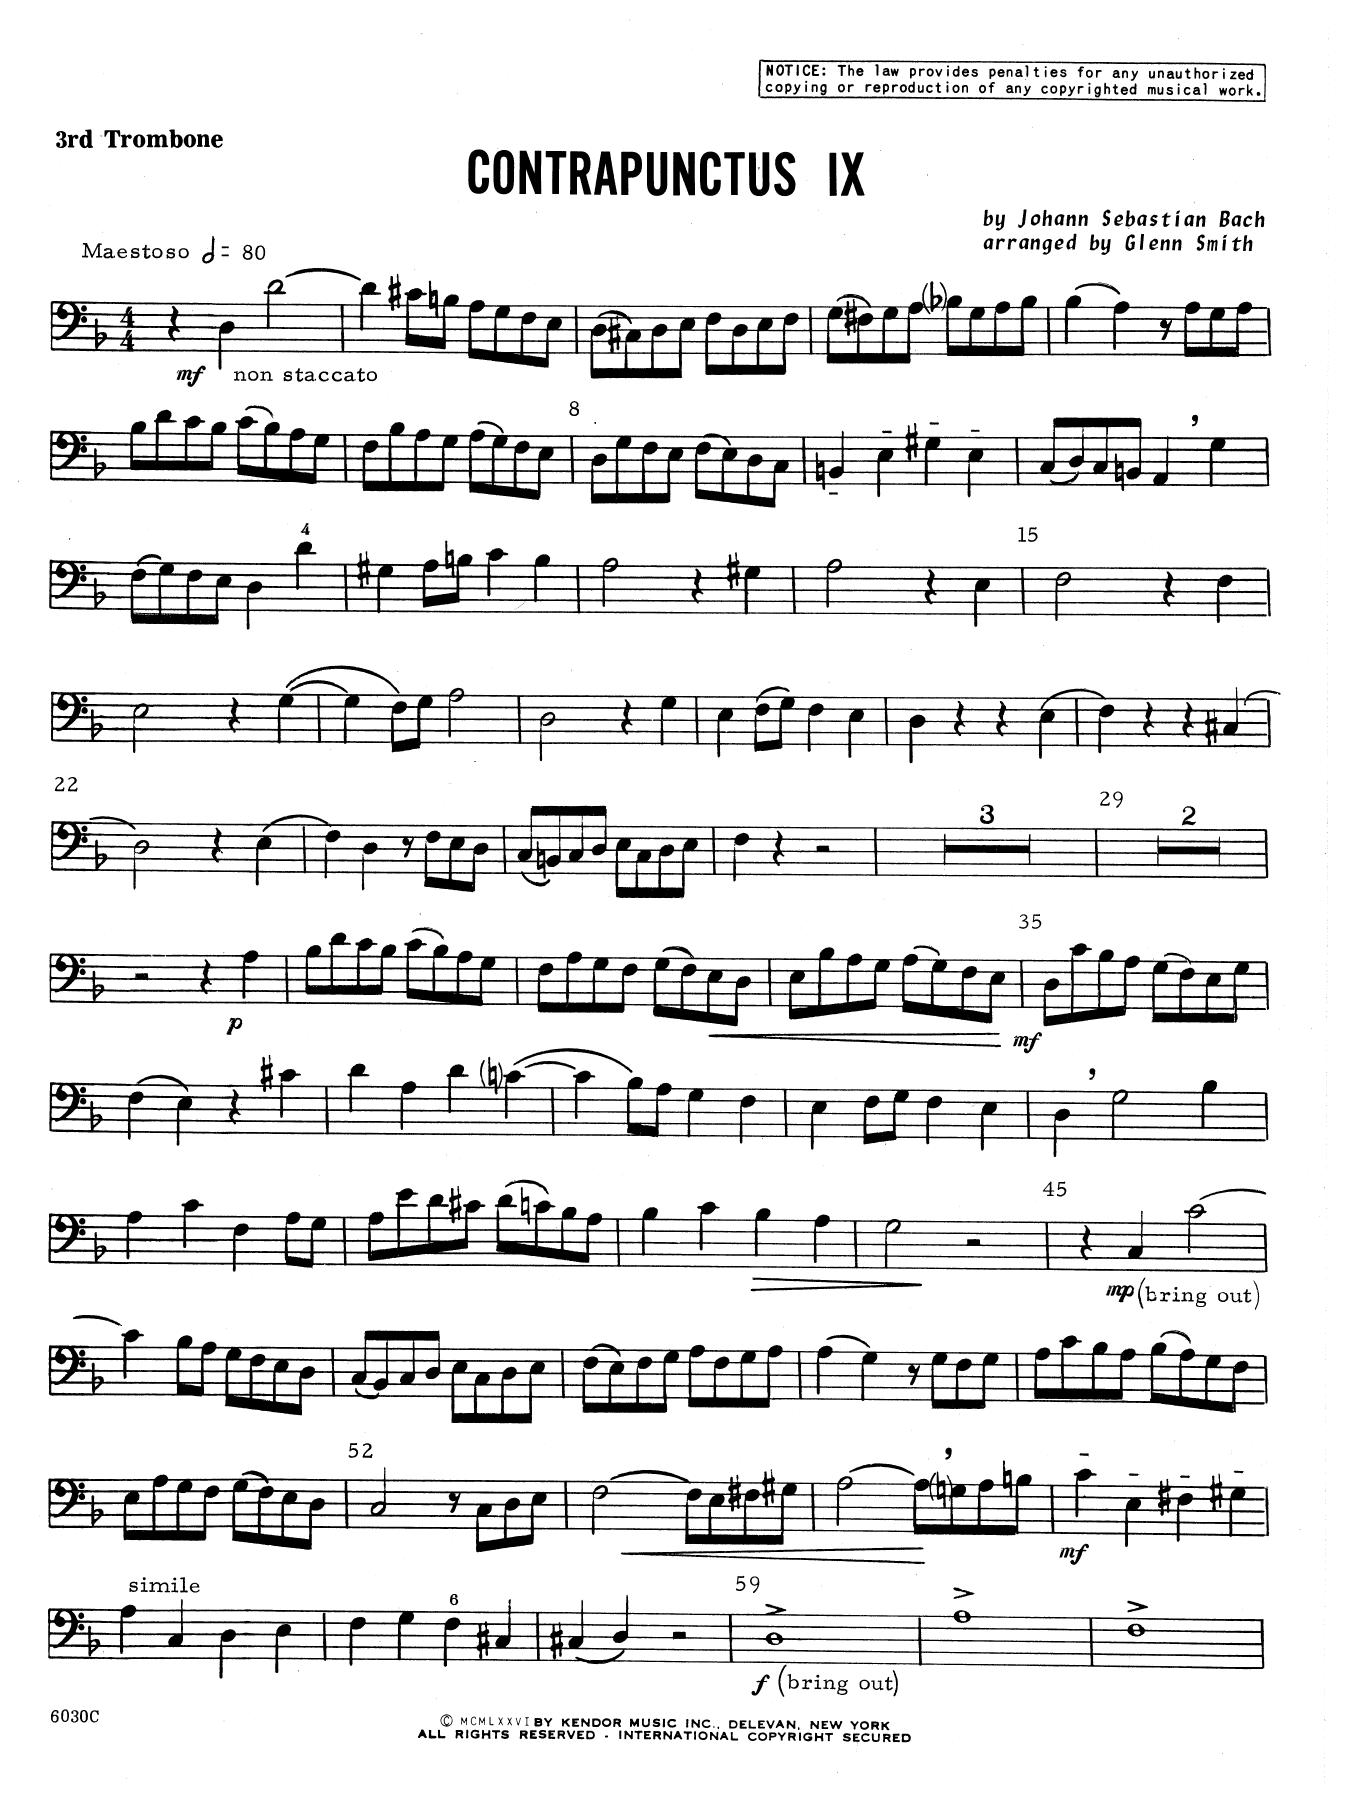 Contrapunctus IX - 3rd Trombone Sheet Music